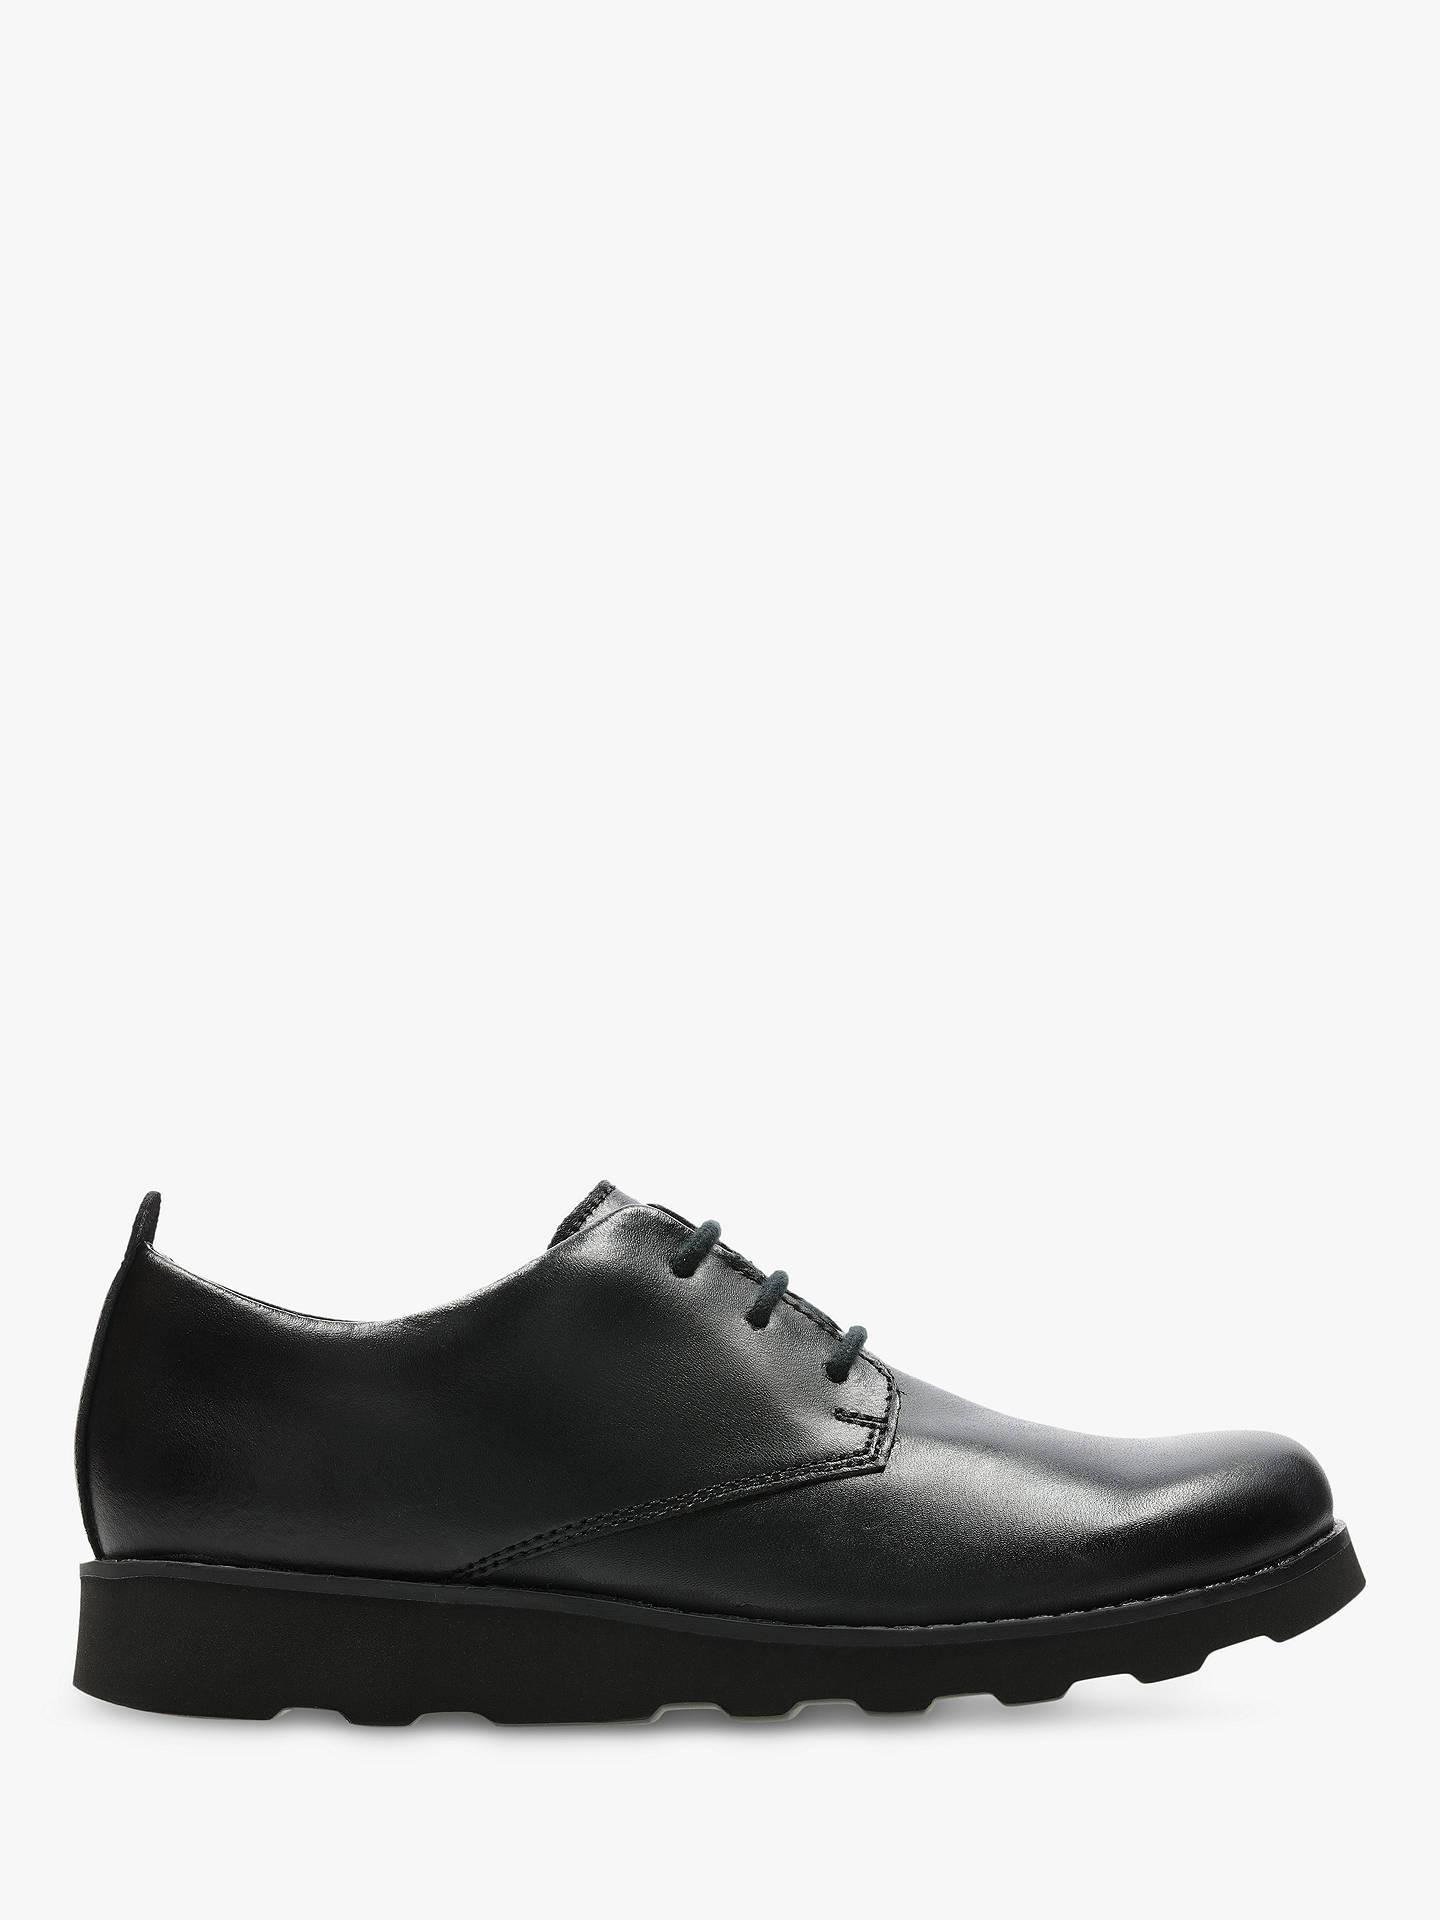 Clarks Children's Crown London Shoes, Black Leather